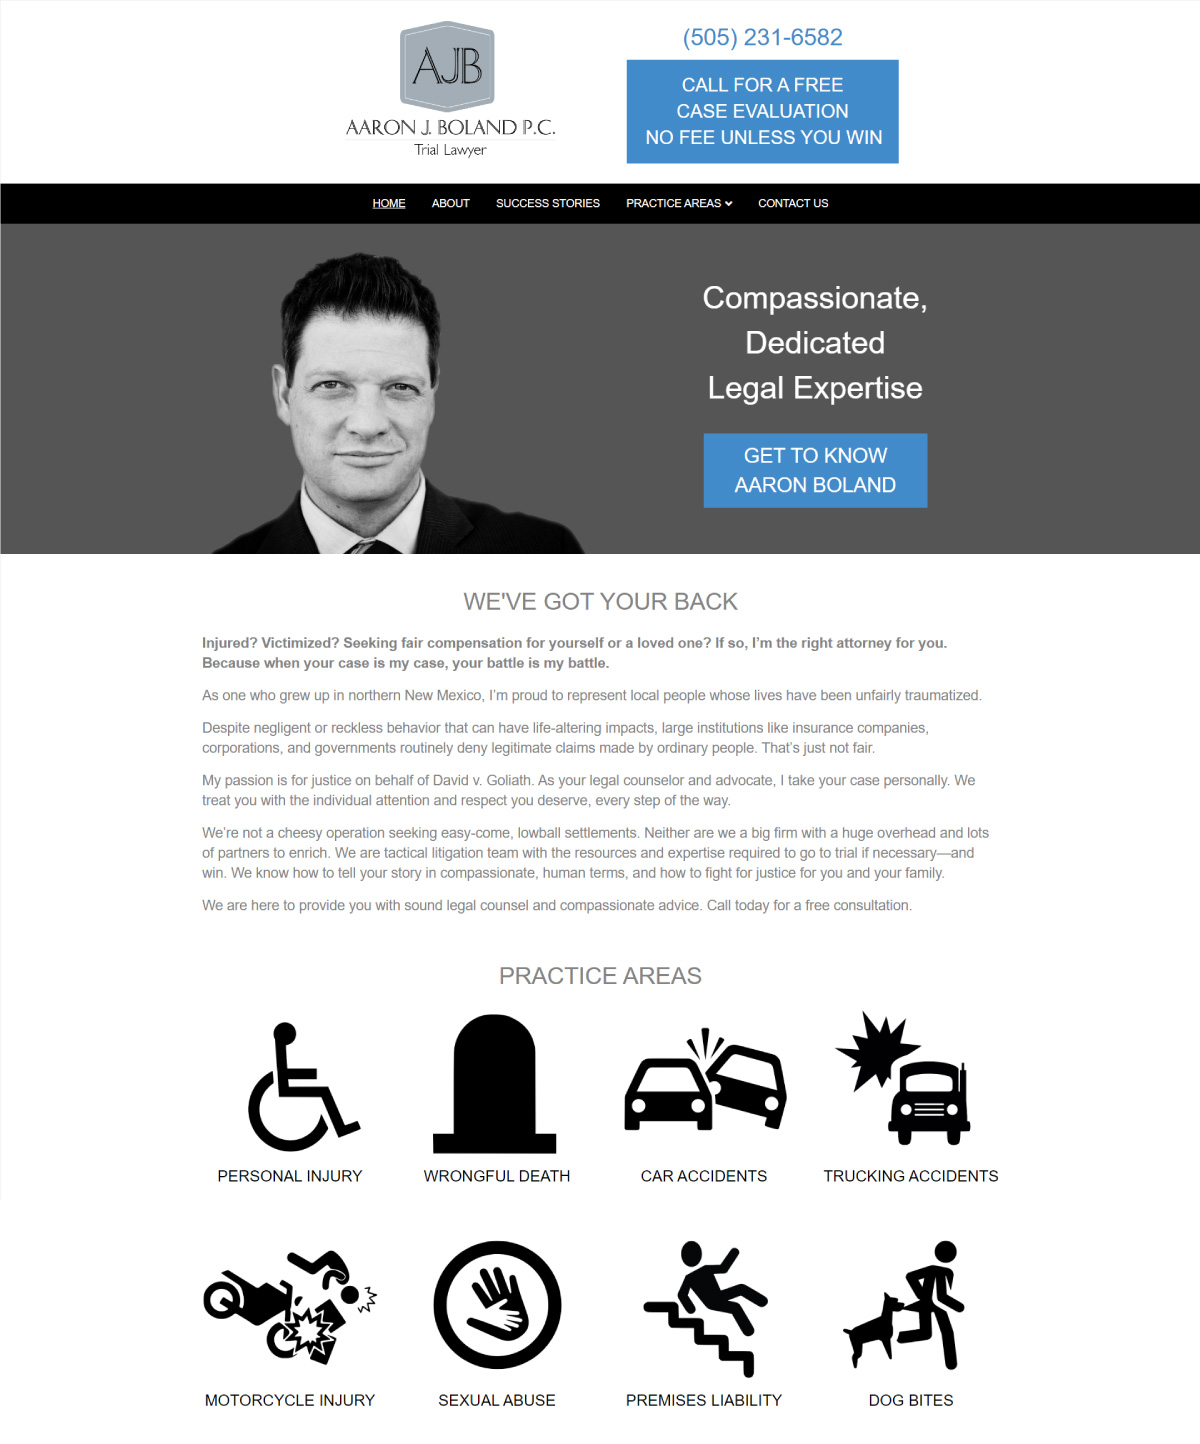 Aaron Boland website